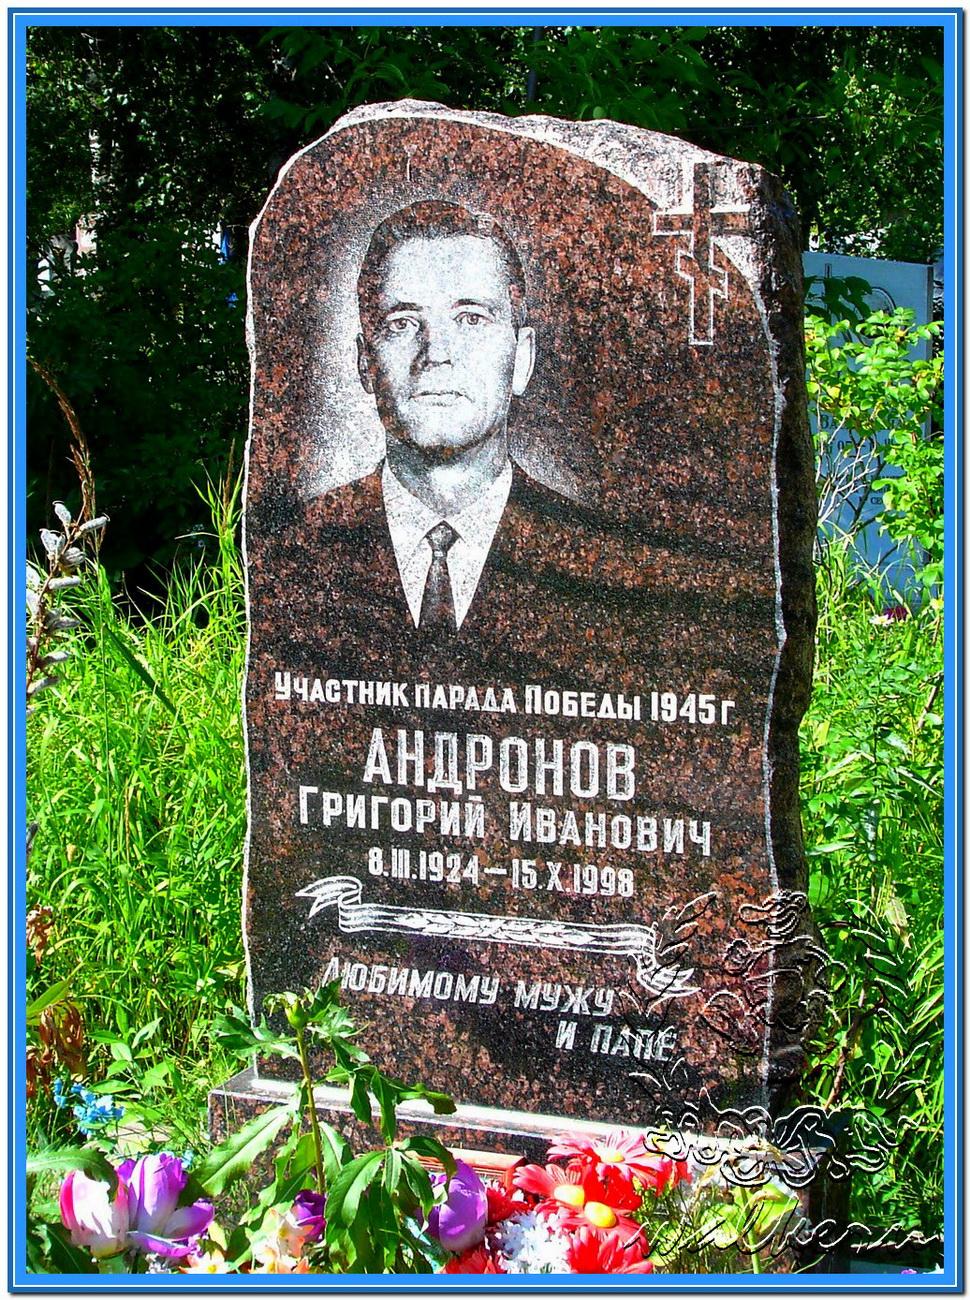 Андронов Григорий Иванович